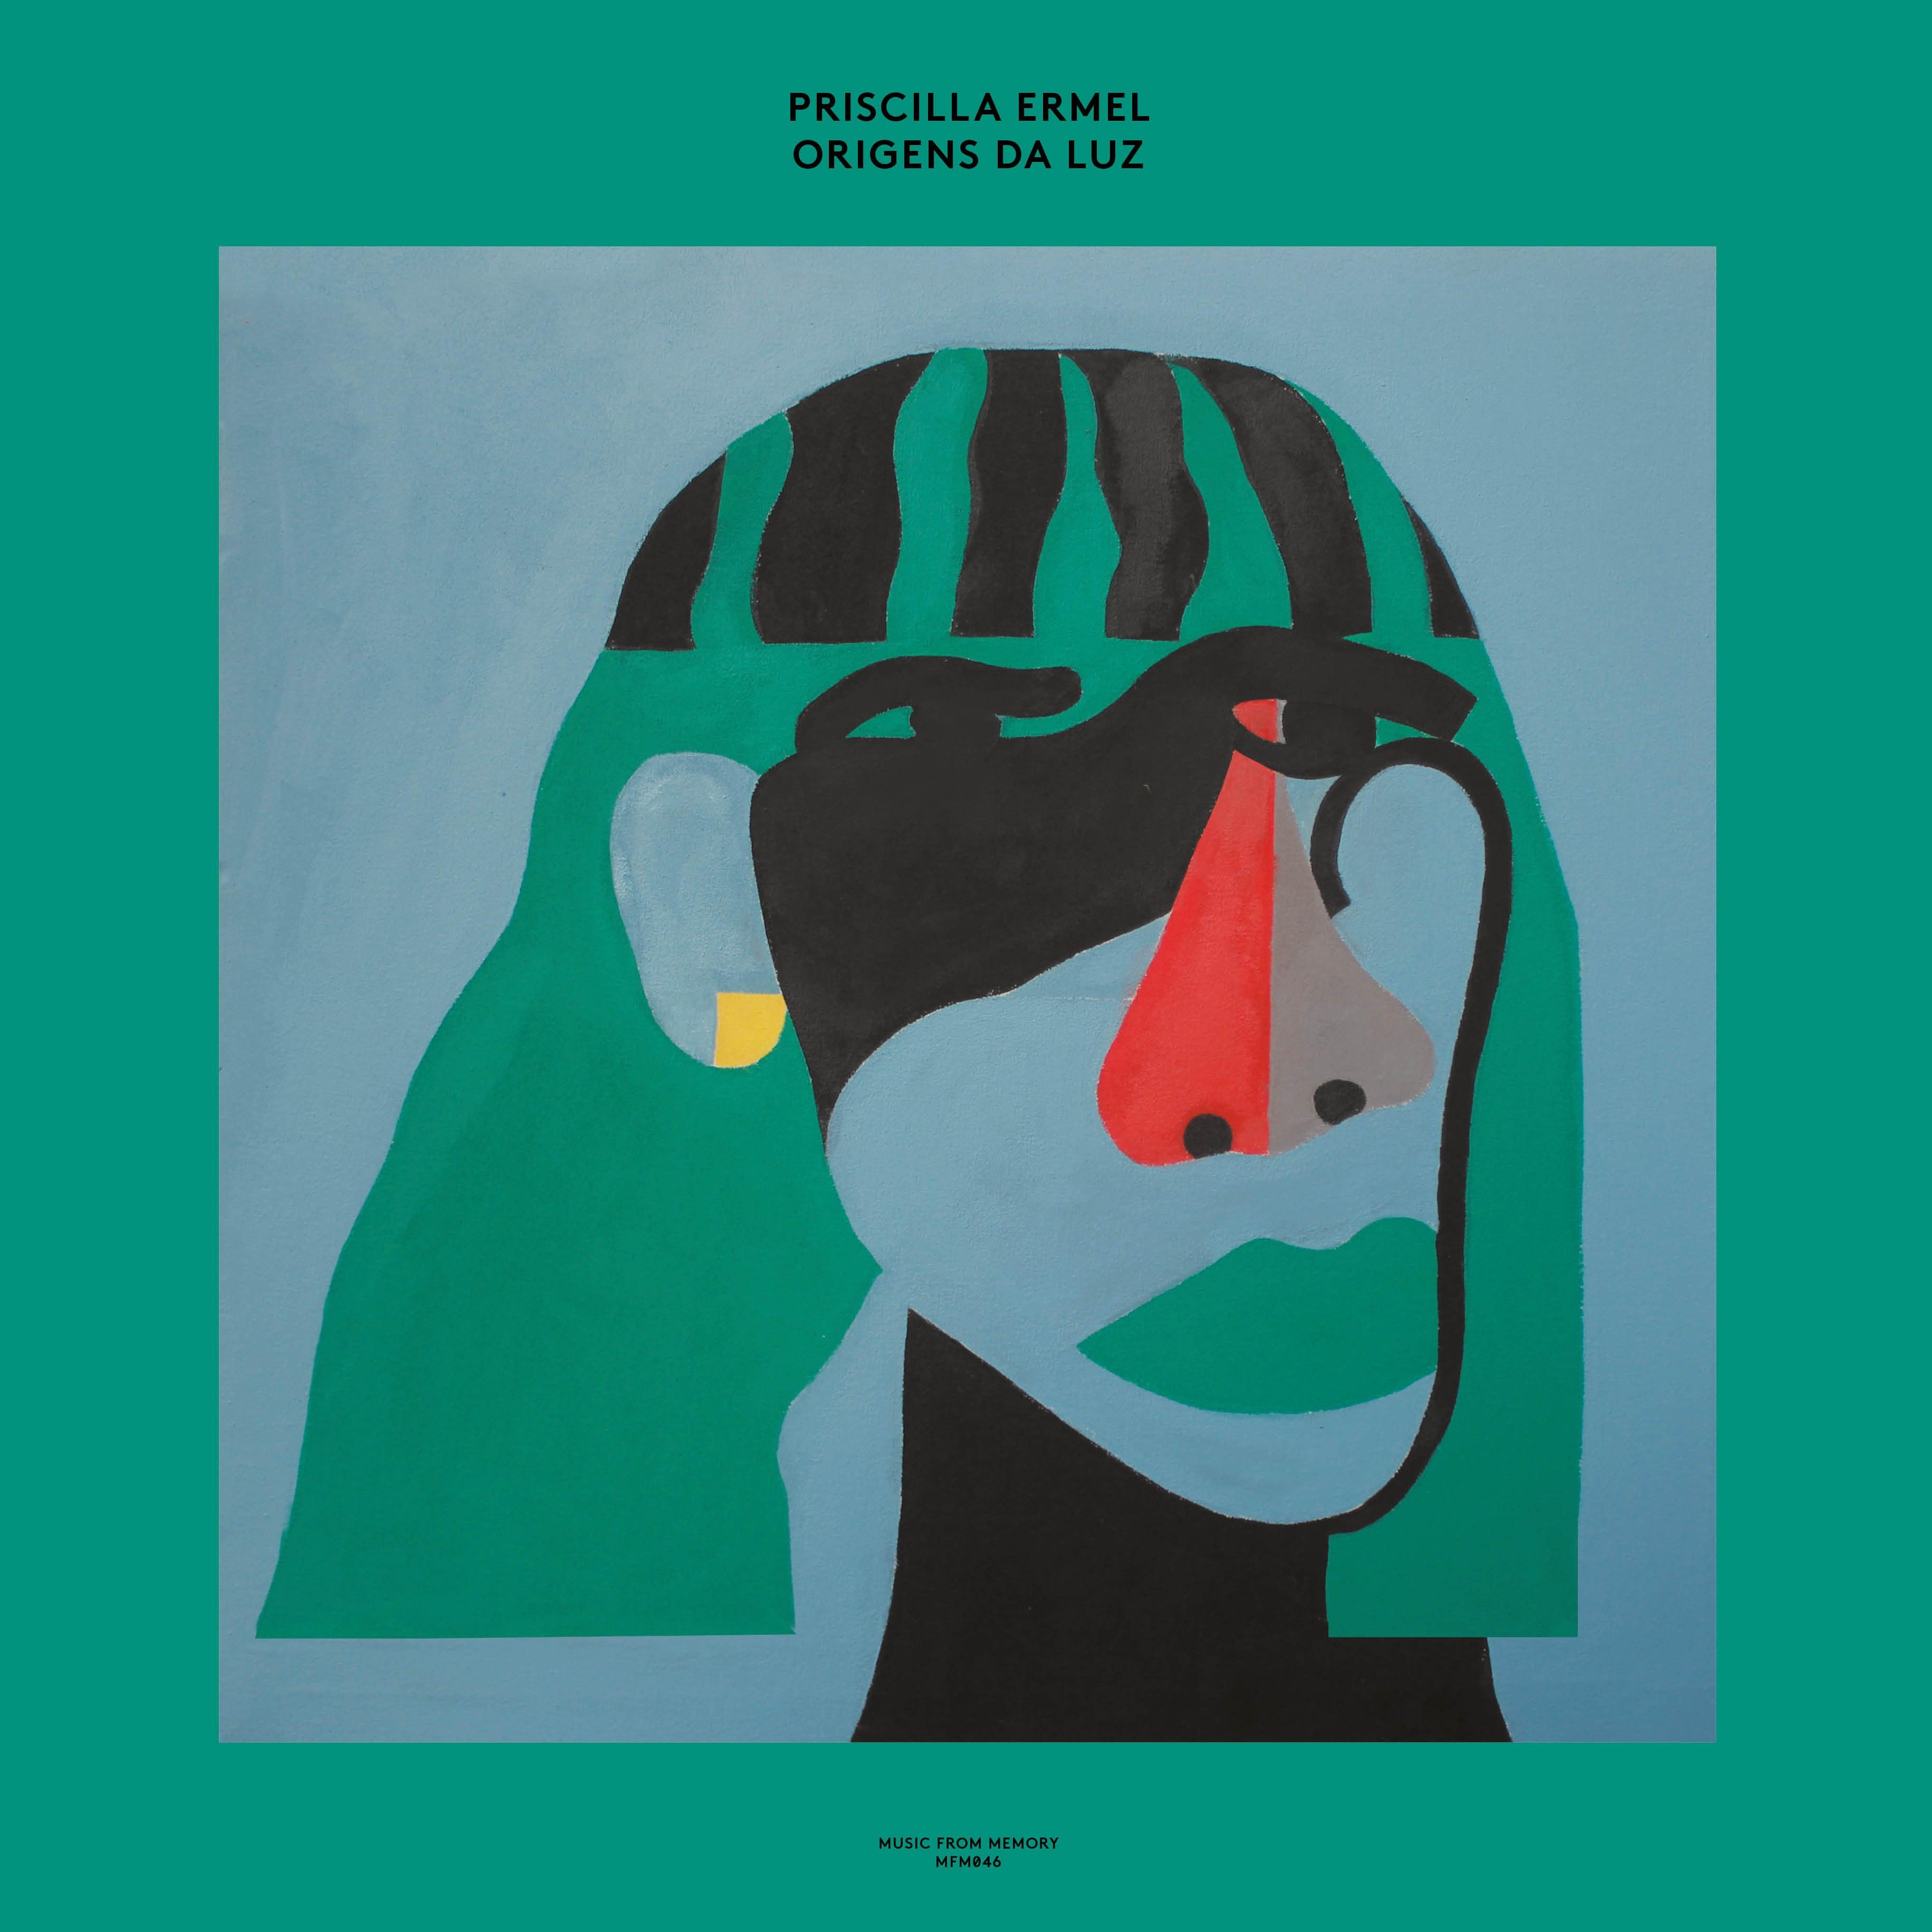 Priscilla Ermel - Origens Da Luz (2LP)